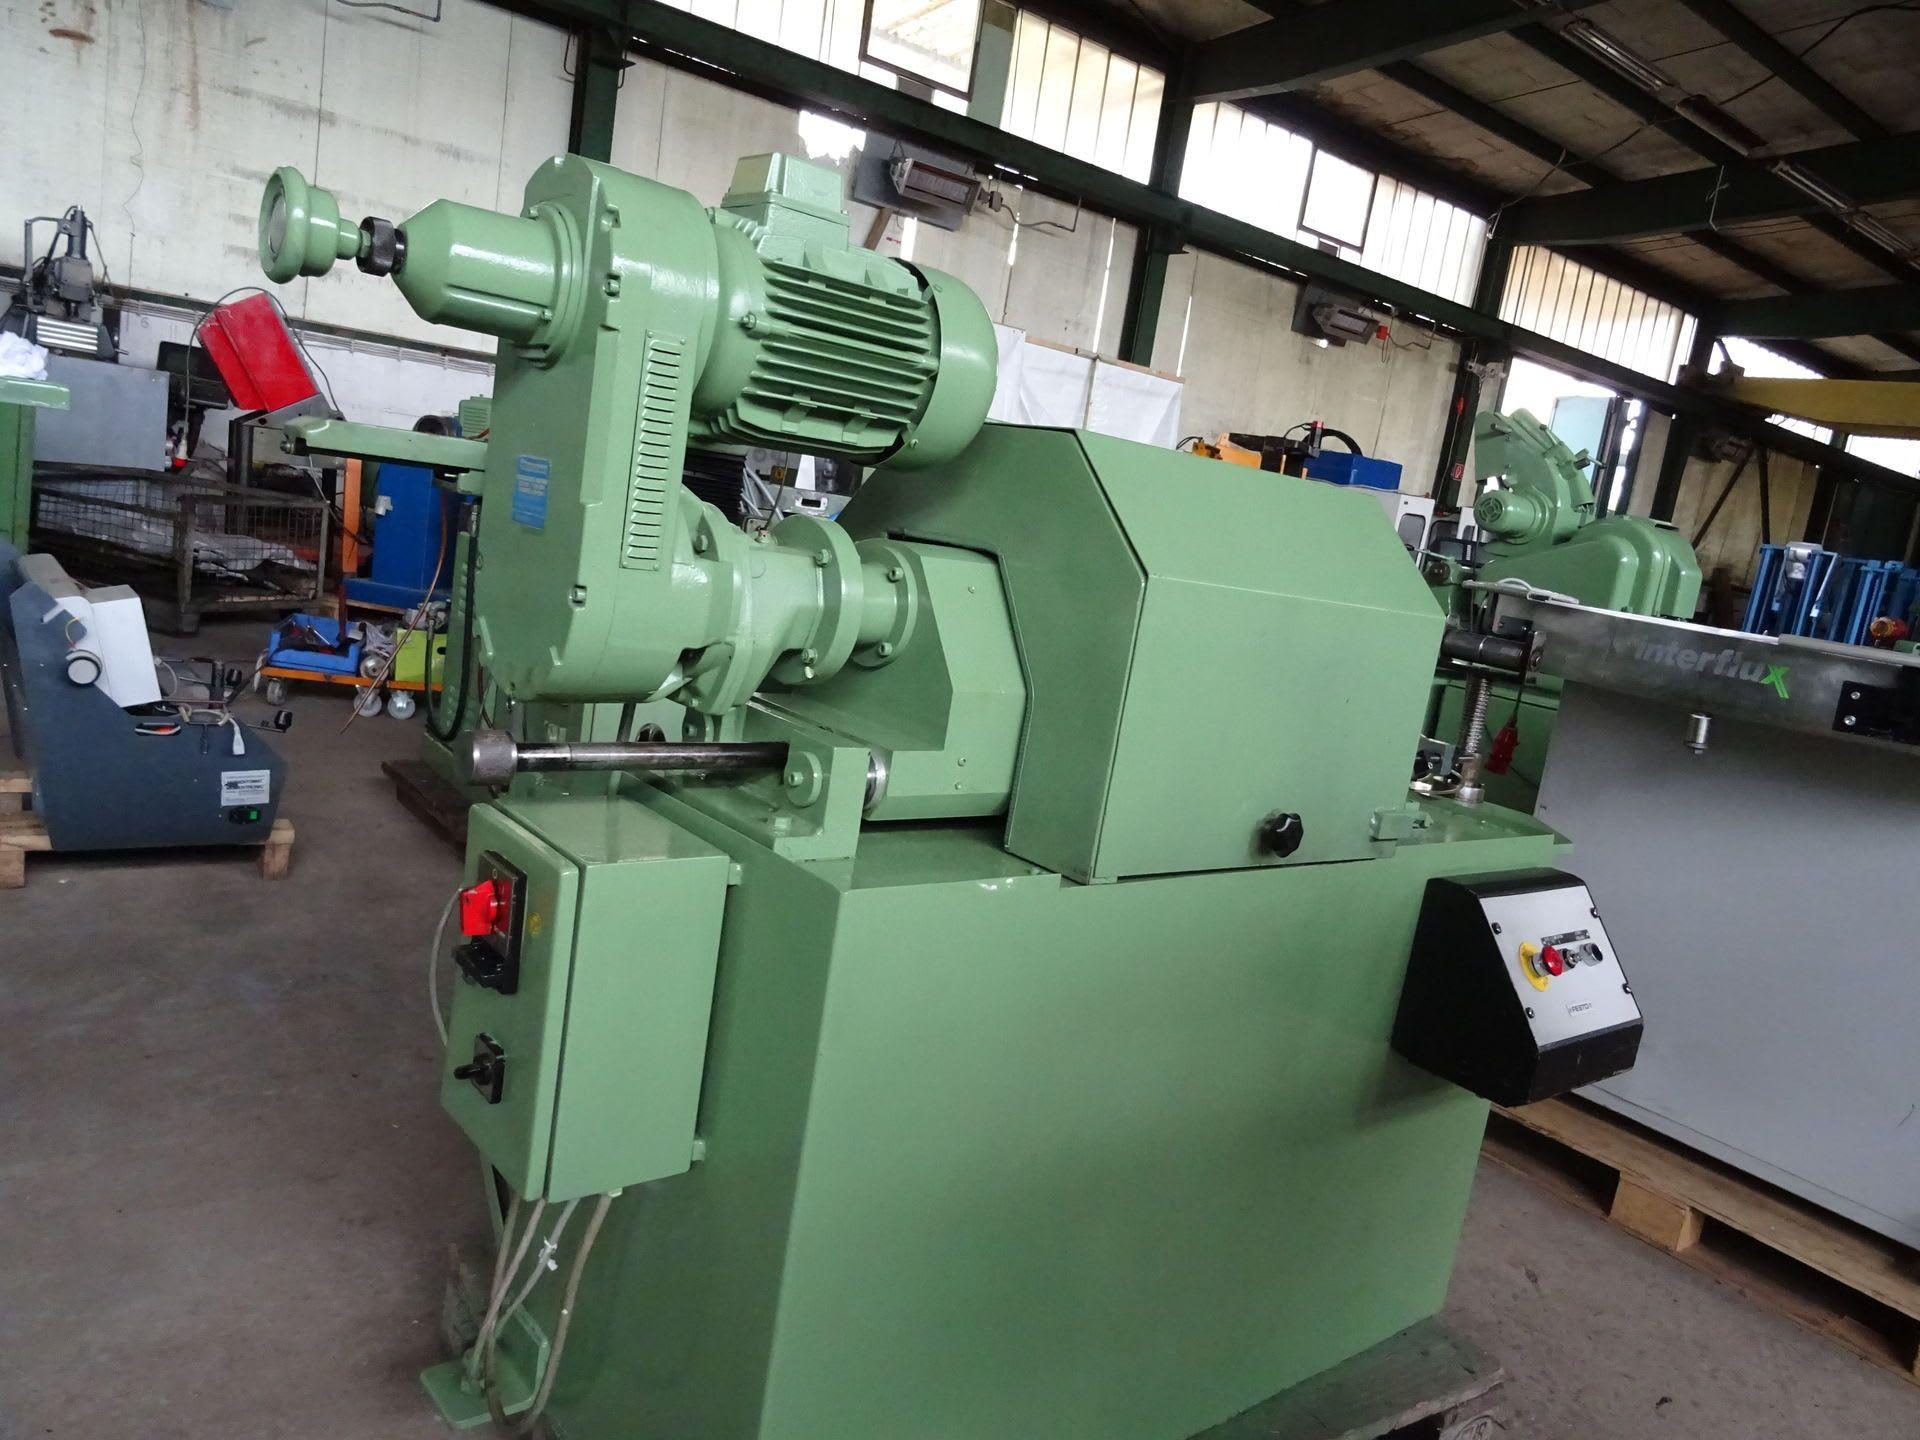 IRCO Wellenanfasmaschine